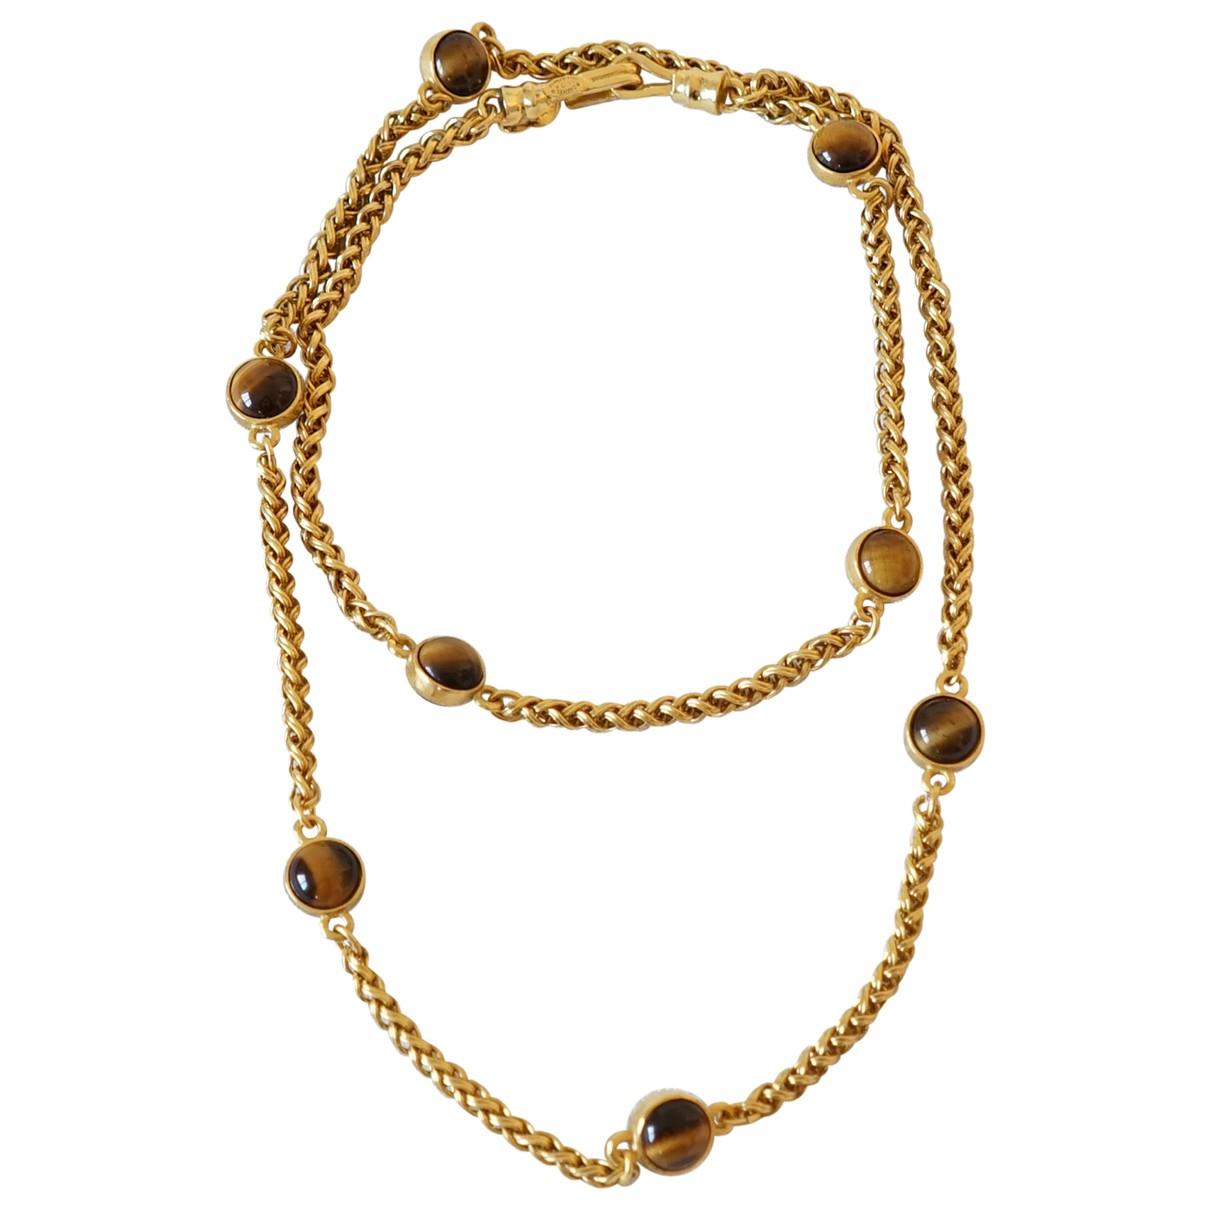 Collar largo Gripoix Chanel